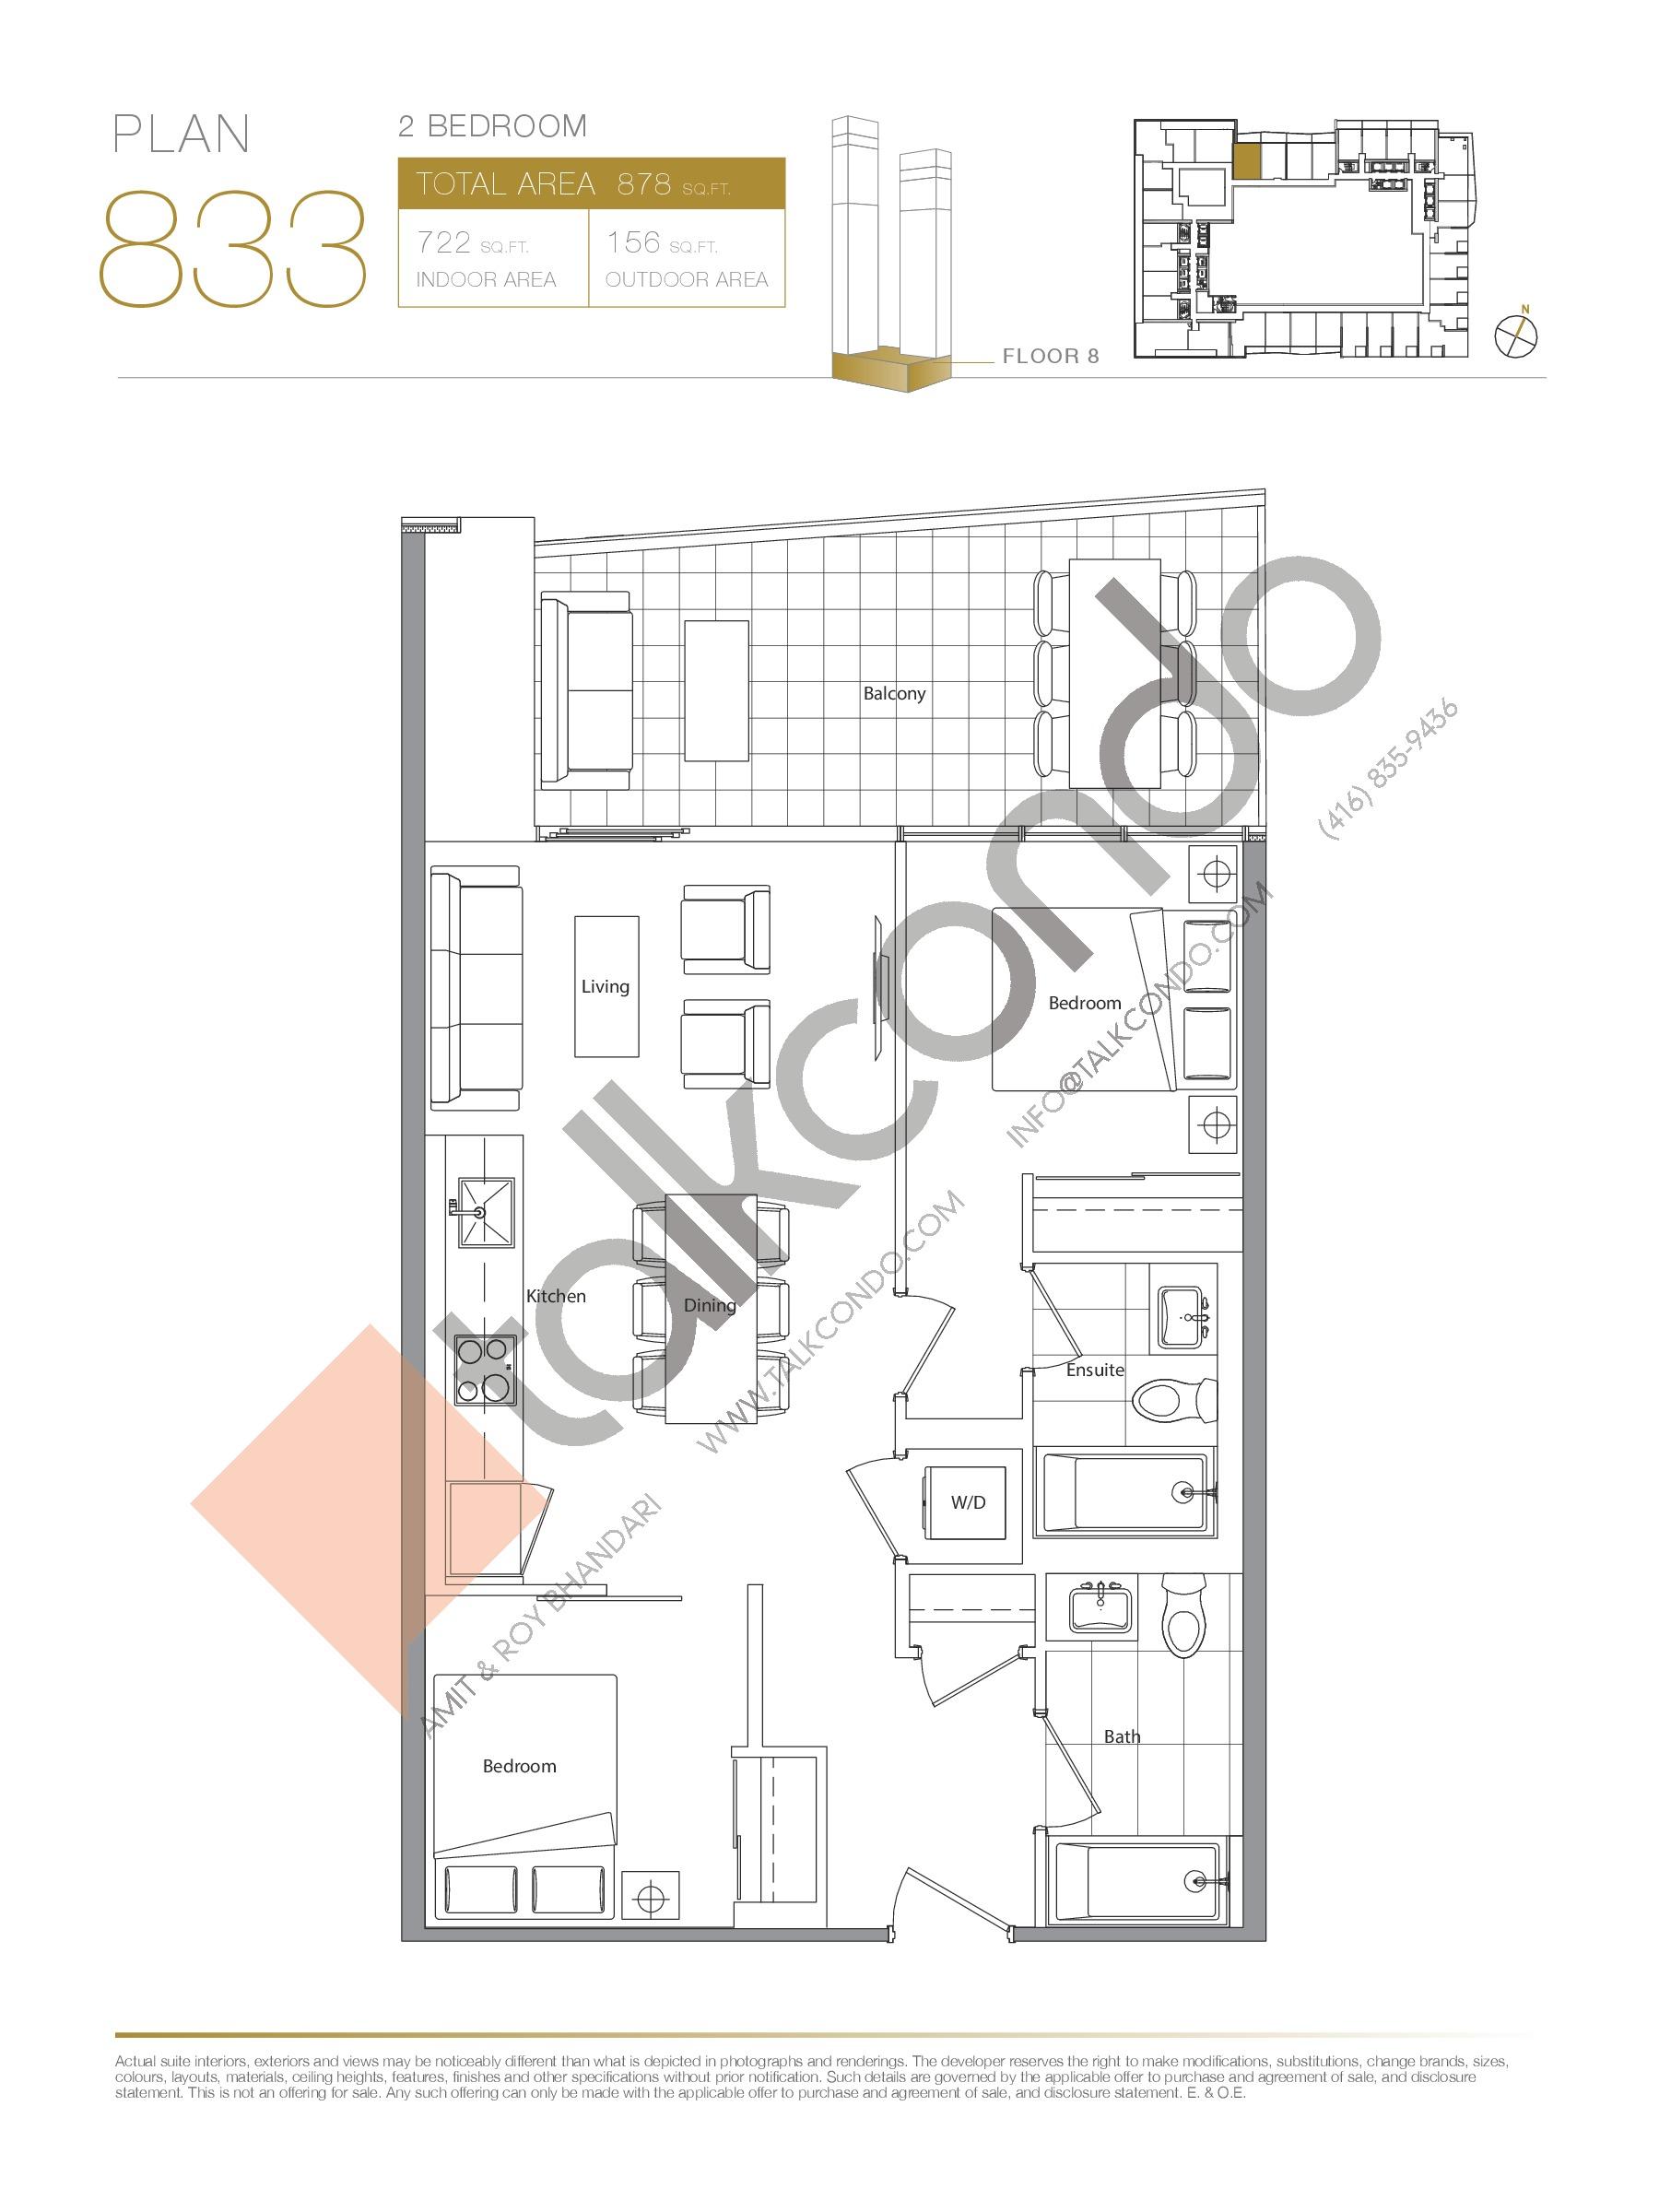 Plan 833 Floor Plan at Concord Canada House Condos - 722 sq.ft